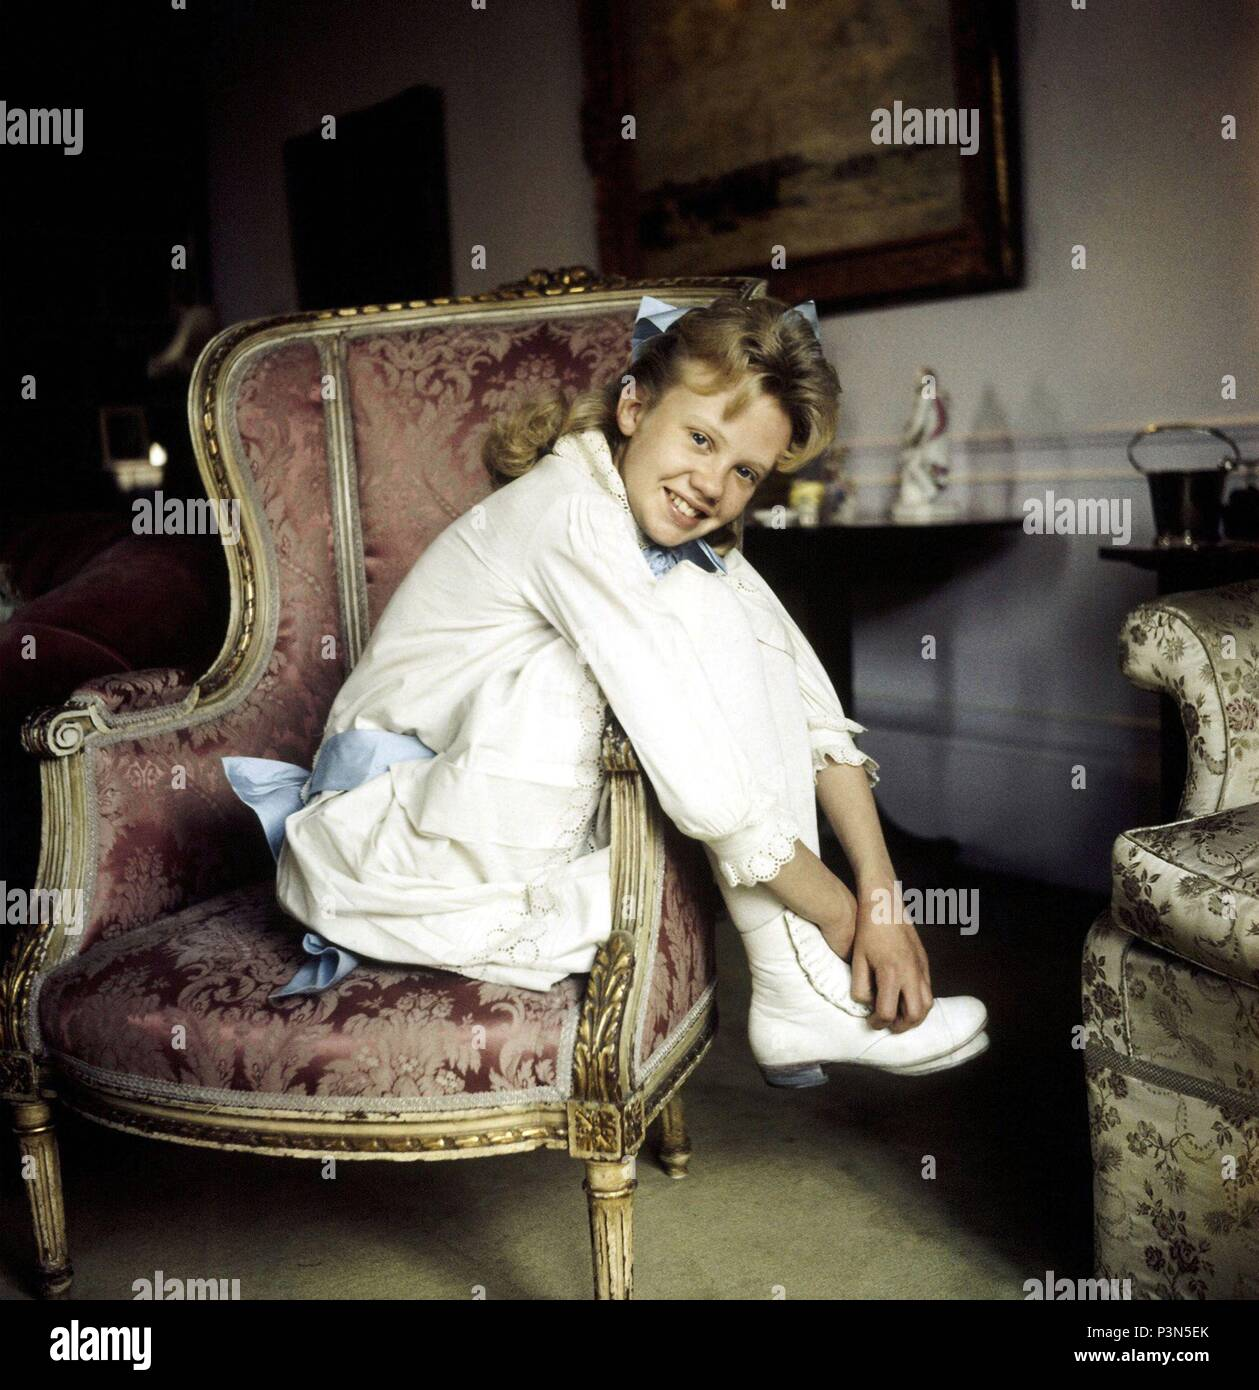 Original Film Title: POLLYANNA.  English Title: POLLYANNA.  Film Director: DAVID SWIFT.  Year: 1960.  Stars: HAYLEY MILLS. Credit: WALT DISNEY PICTURES / Album - Stock Image